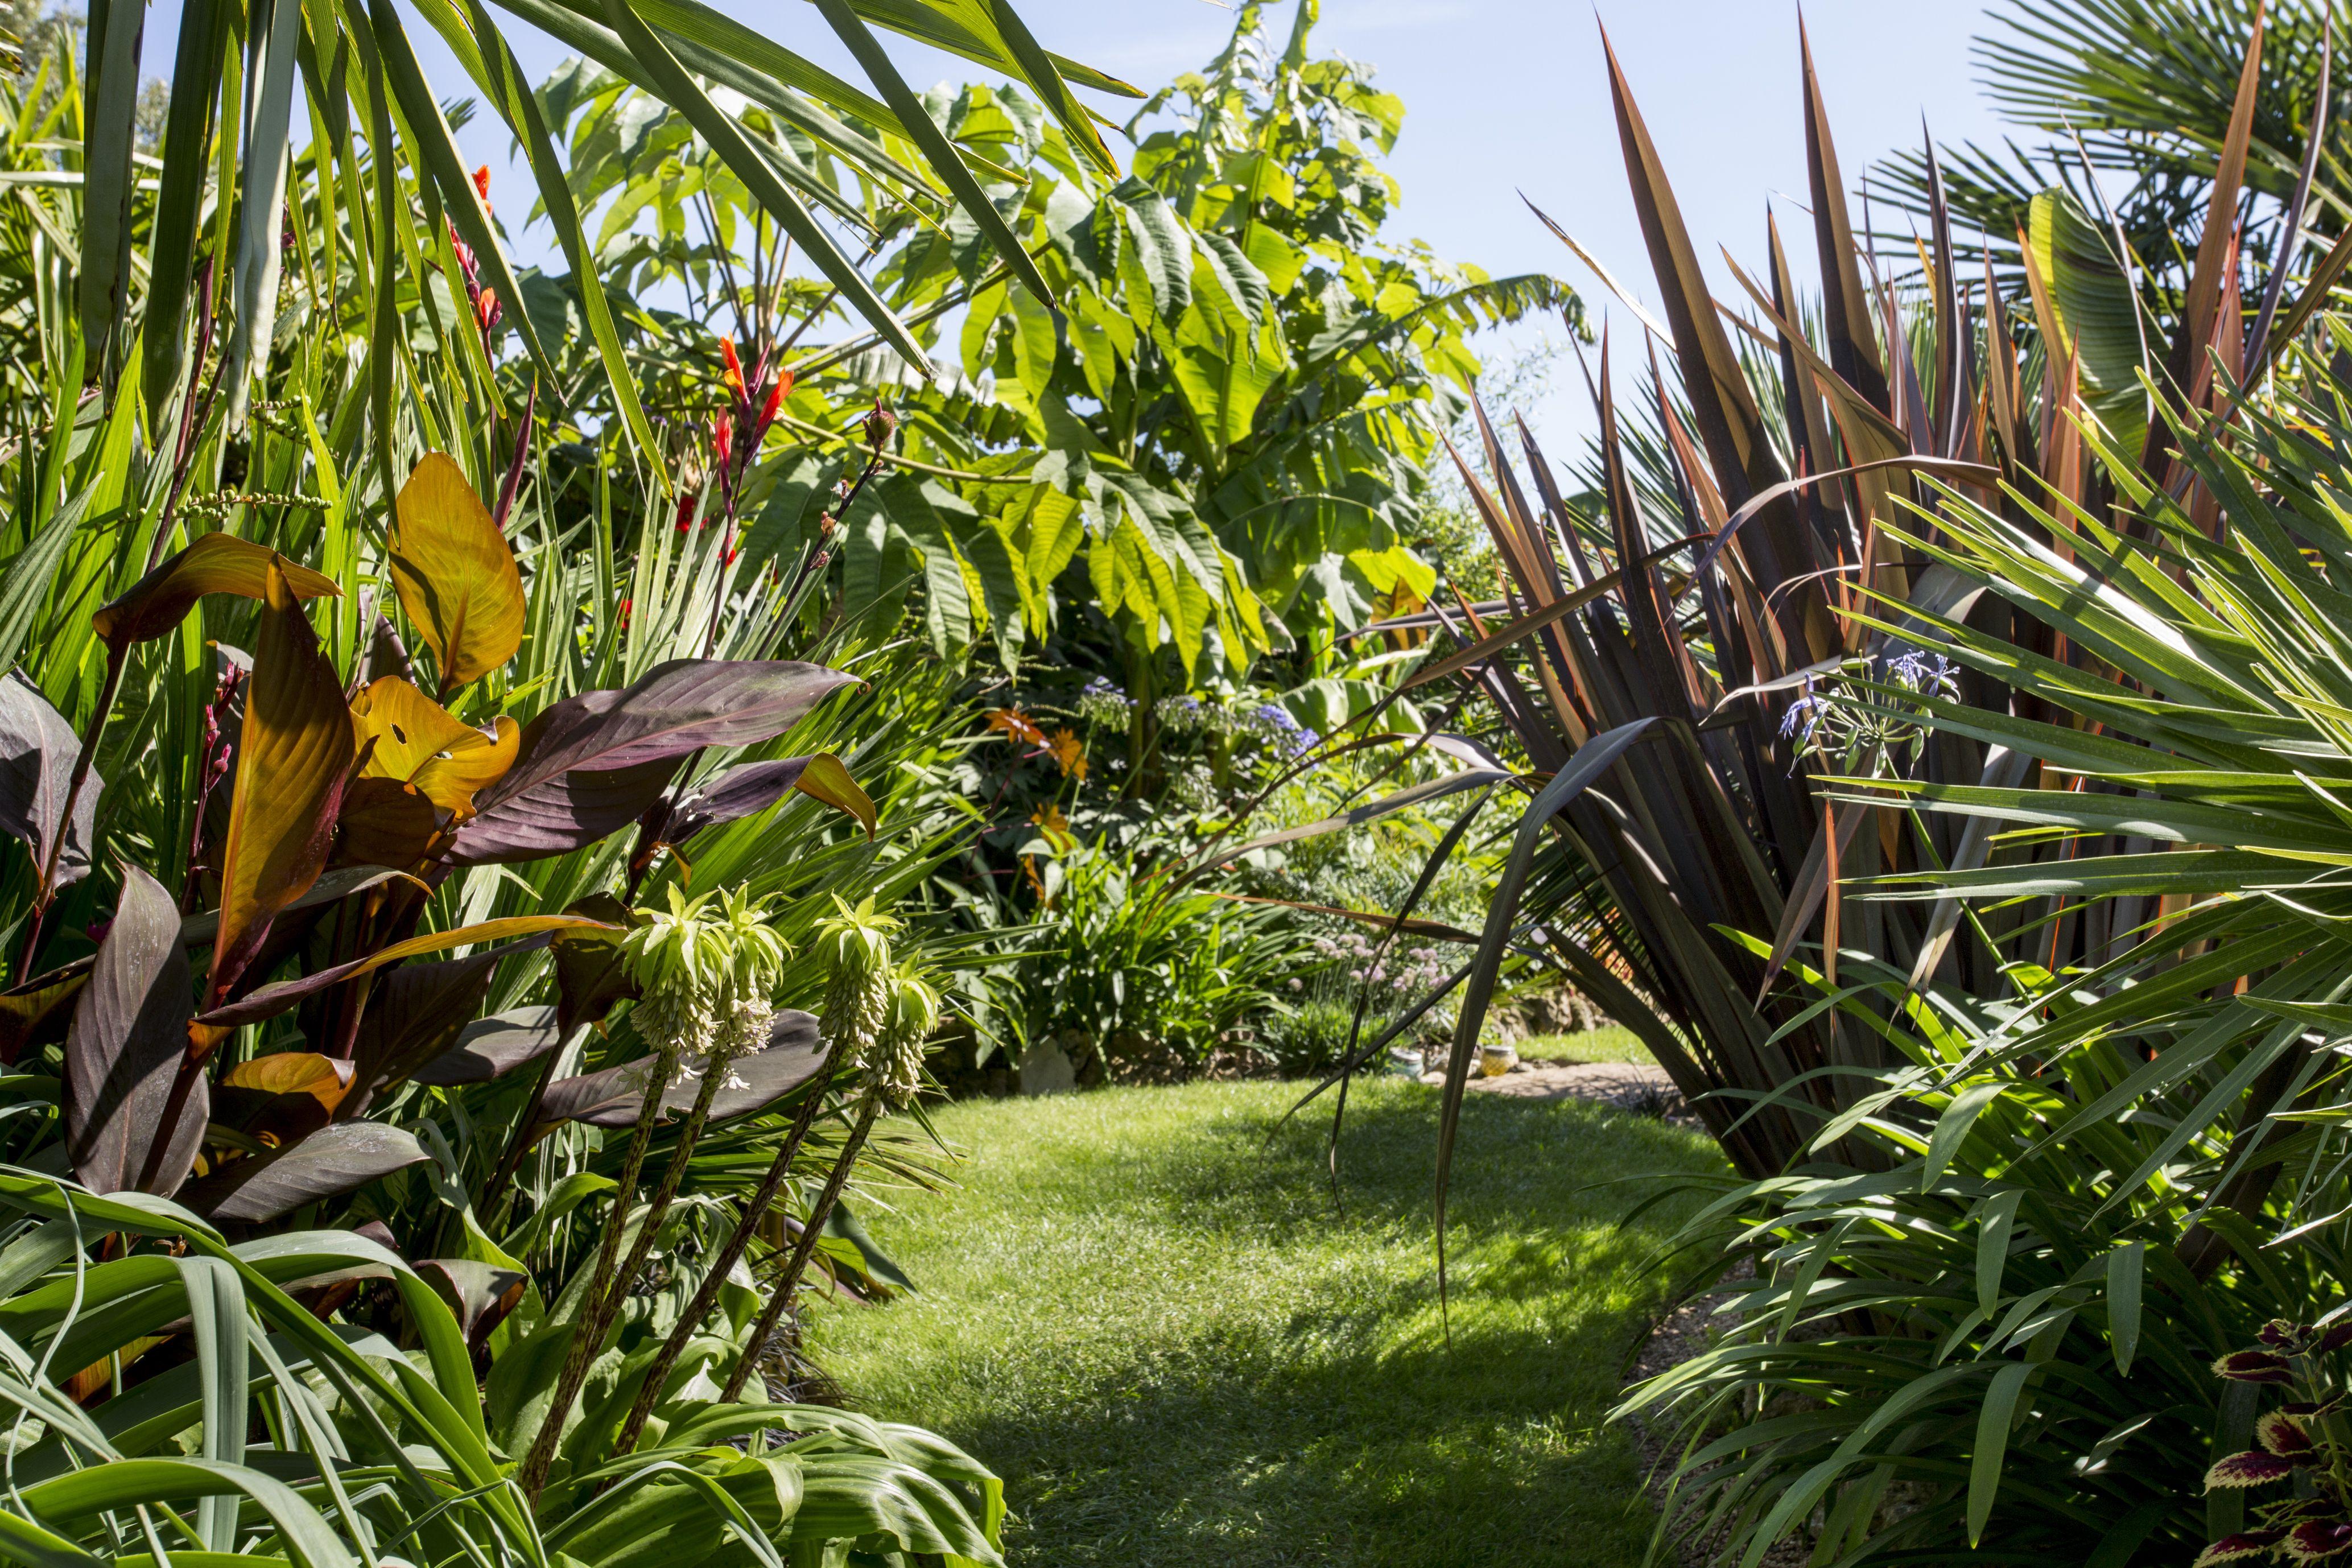 steve moodey tropical hideaway small spaces - Tropical Garden 2016